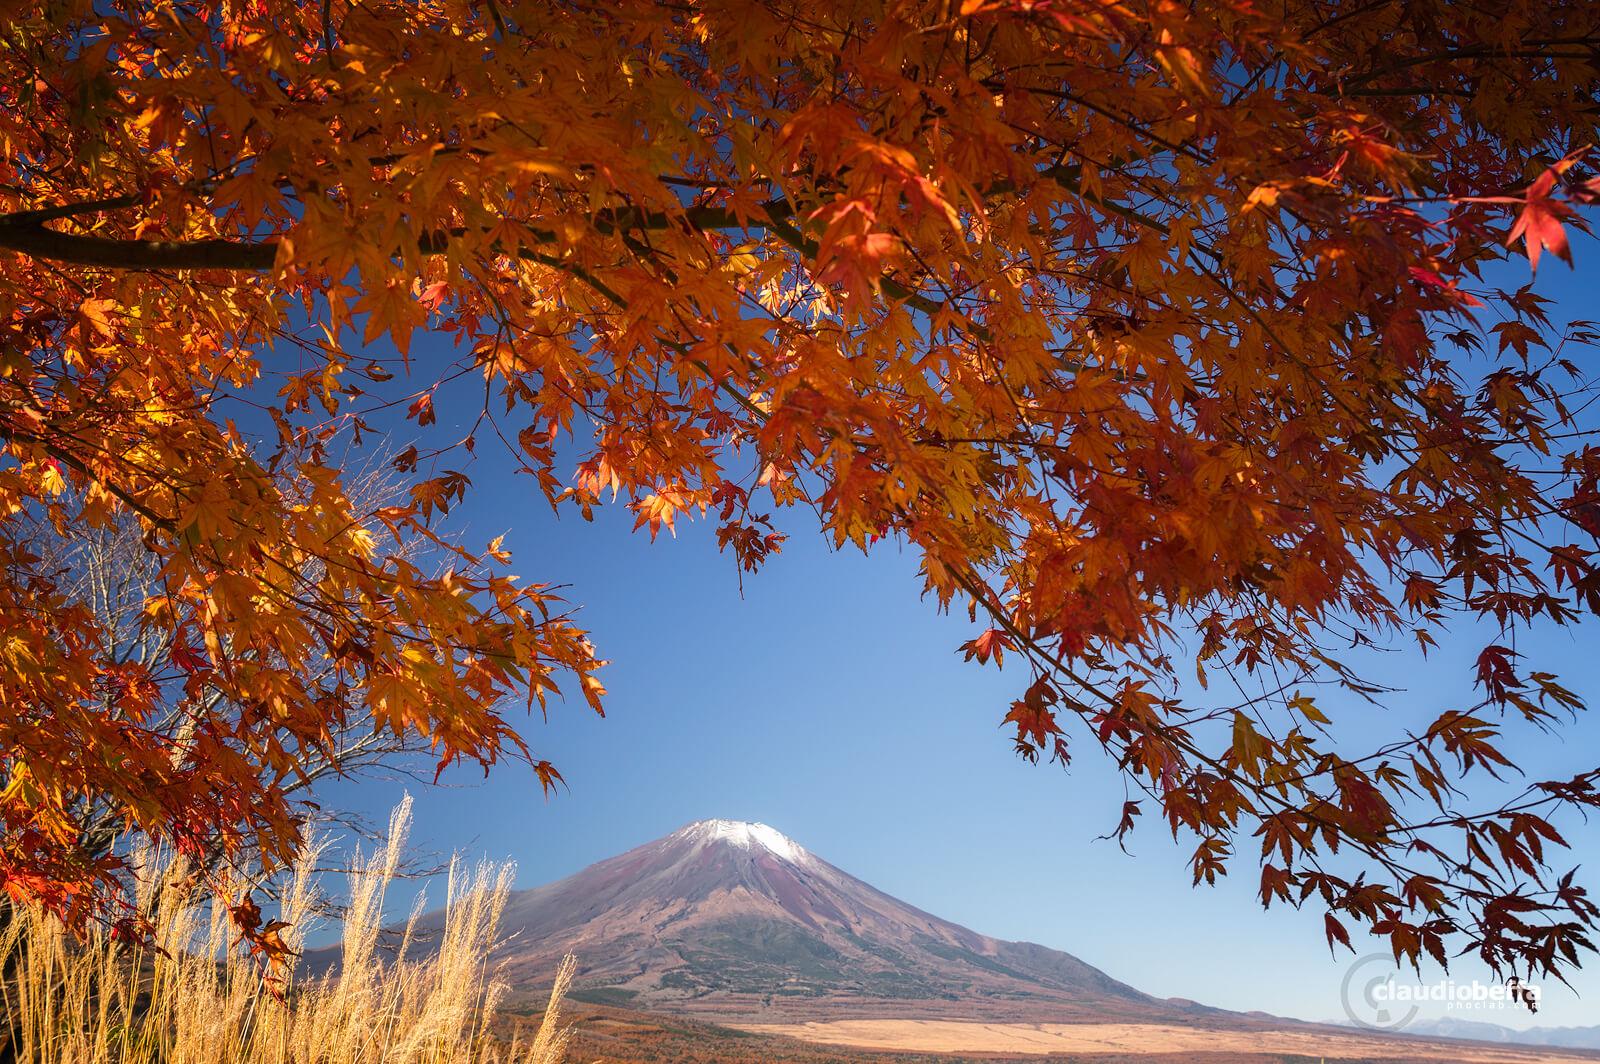 Mount Fuji, Fuji, Japan, Chubu, autumn, autumn wonderland, fall, momiji, susuki, red, orange, travel, phoclab